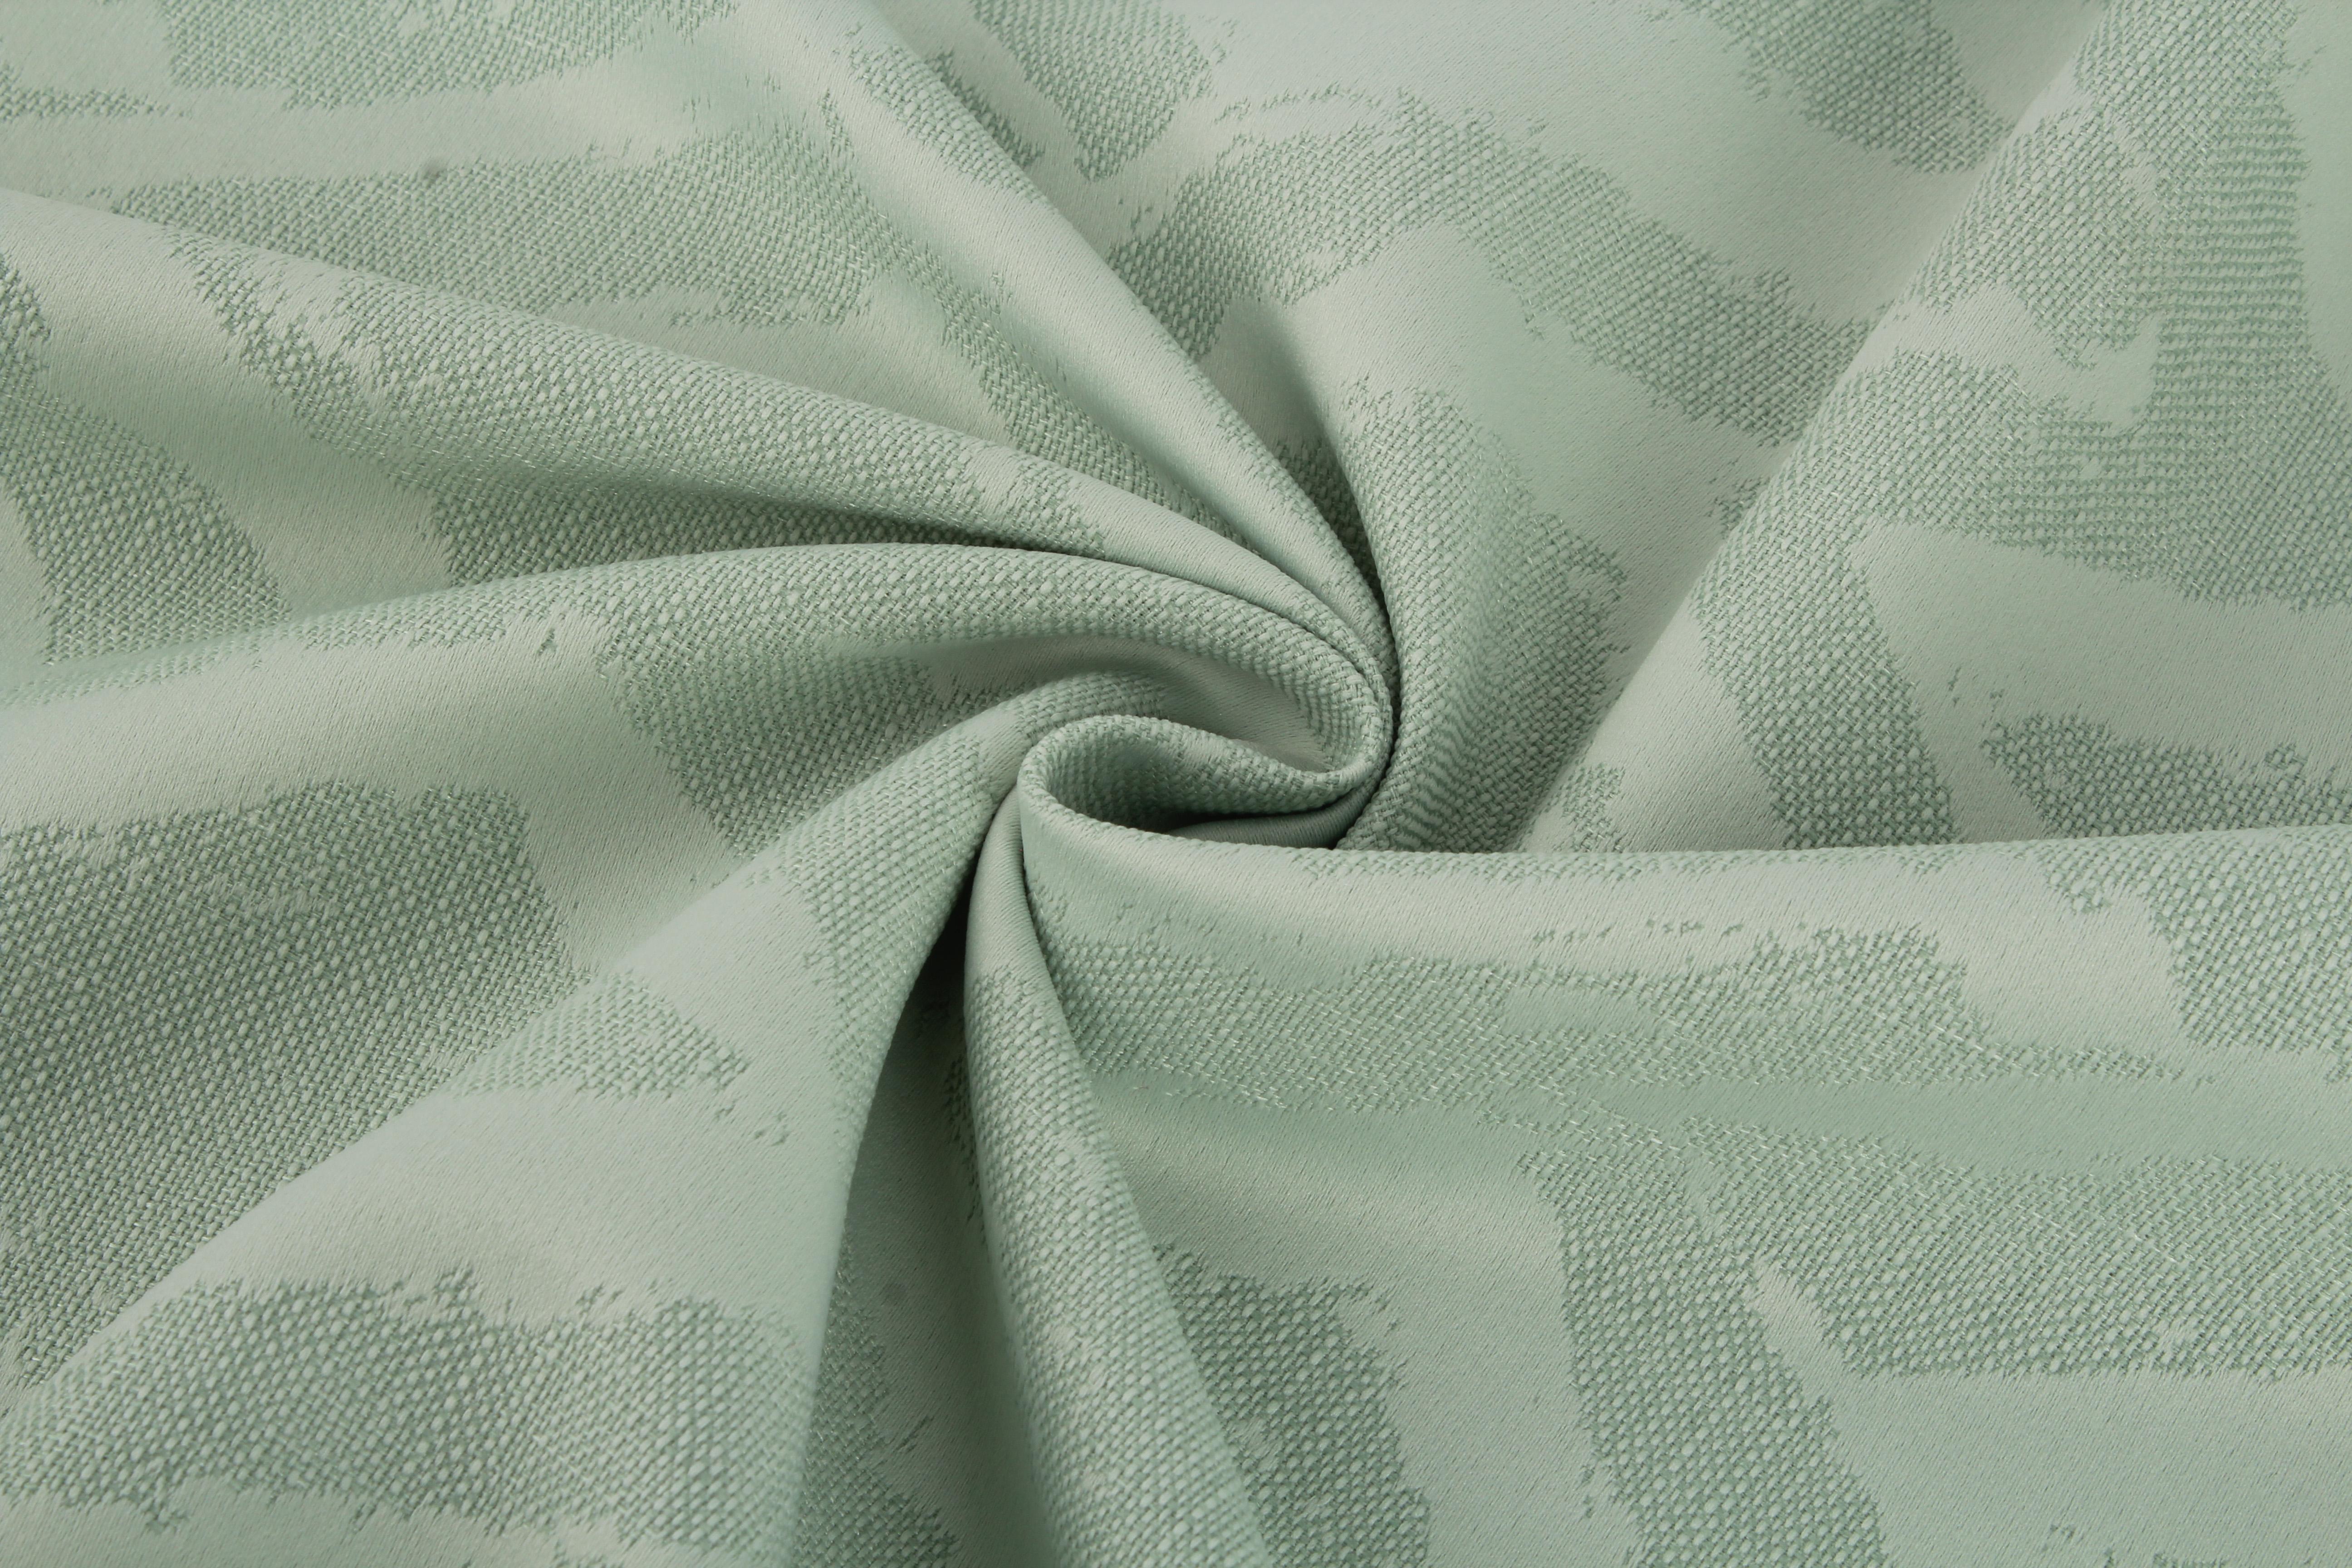 {} TexRepublic Материал Жаккард Rhombuses Цвет: Зеленый